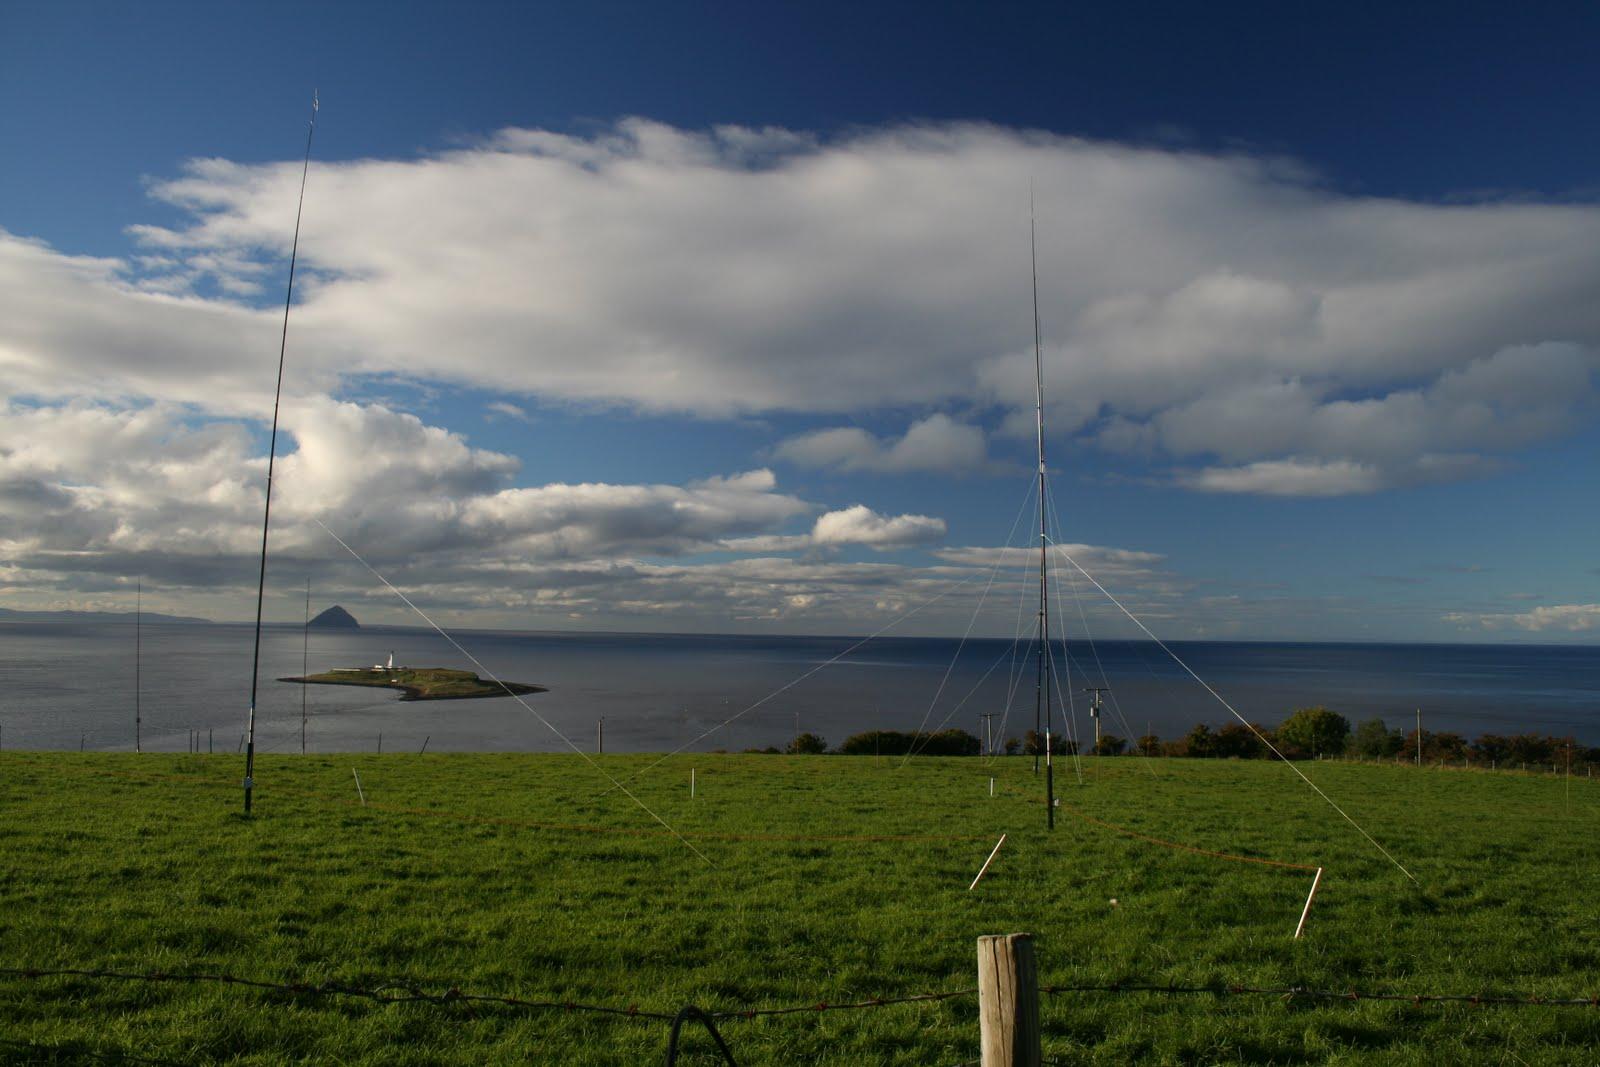 IMG 0943 Sands Amateur Radio Contest